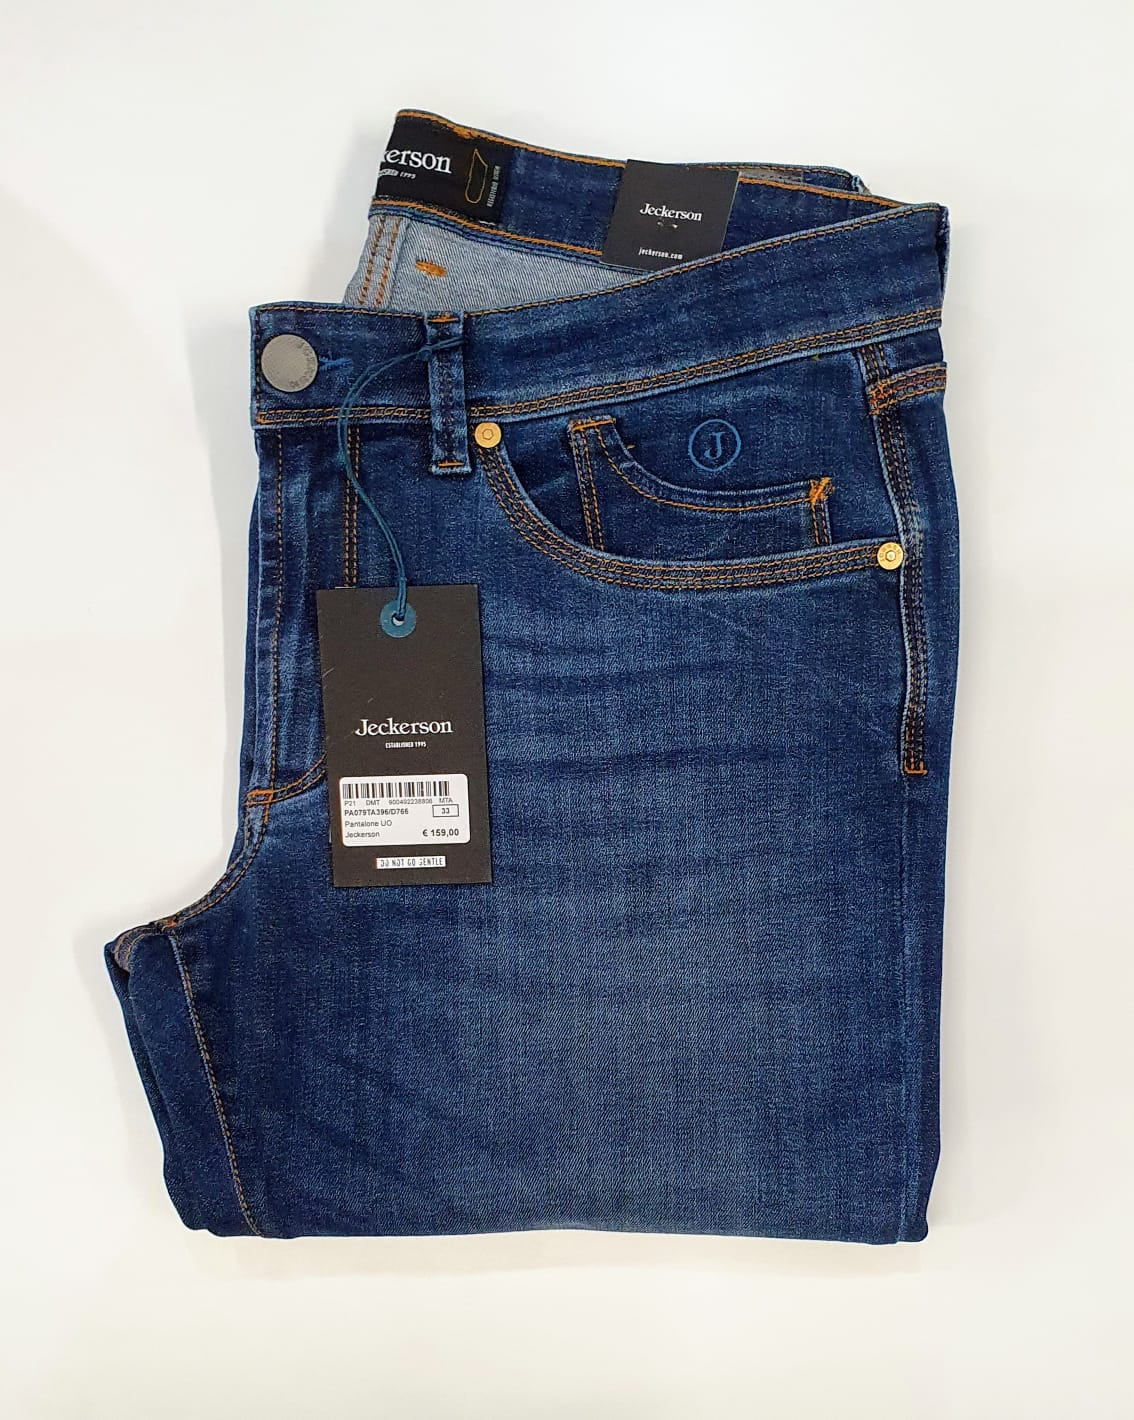 Jeckerson jeans cinque tasche slim senza toppa blu